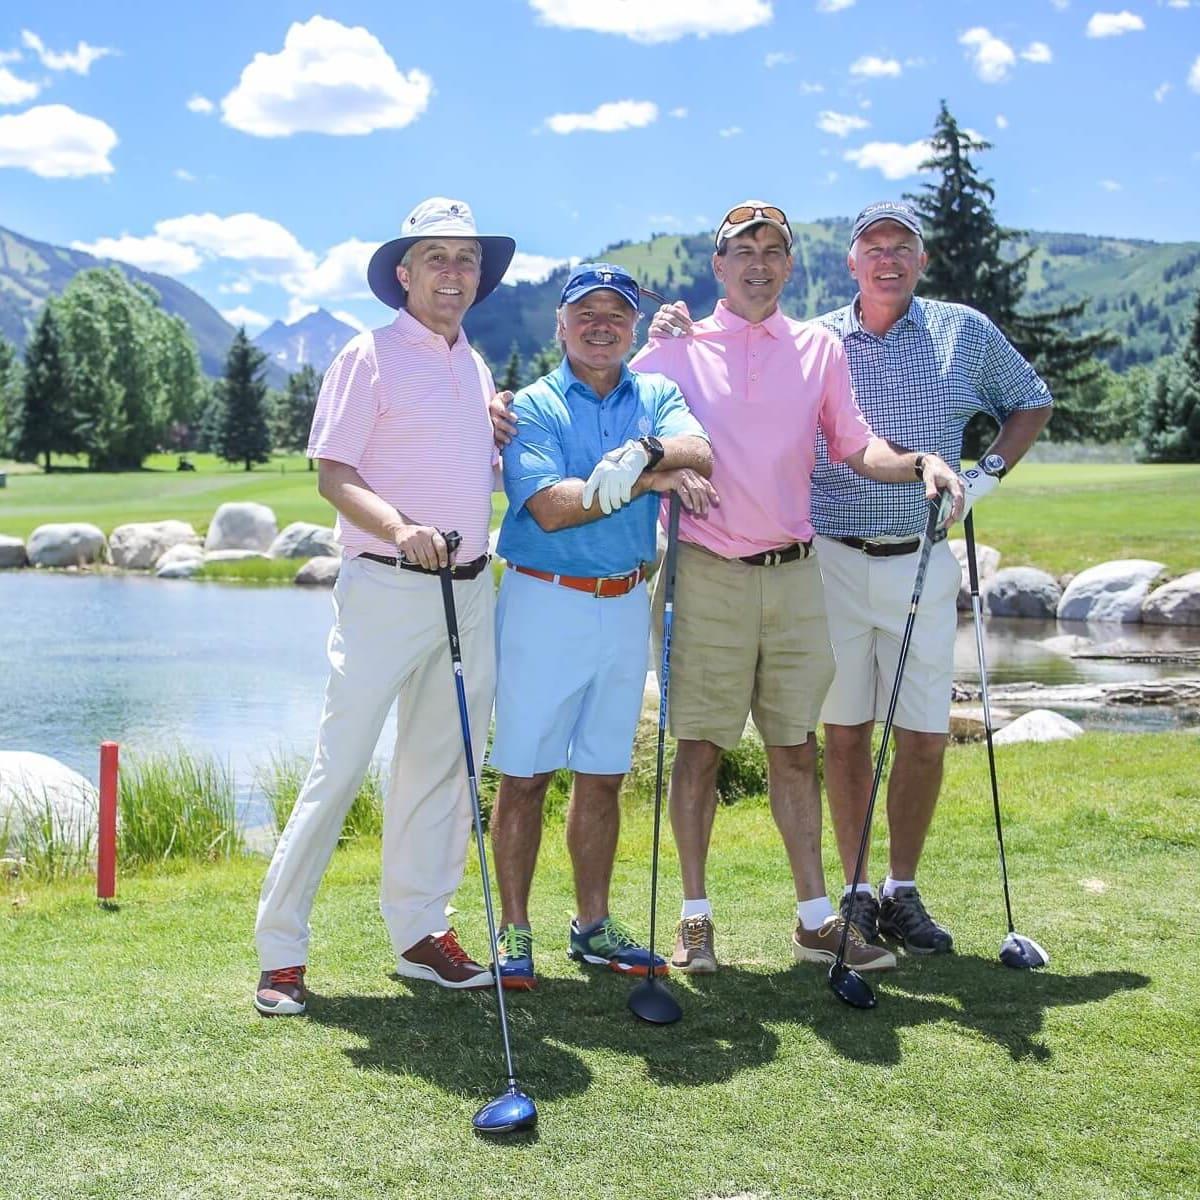 Houston Methodist in Aspen, July 2016,  Tom Elsenbrook, David Dominy, Les Csorba, Todd Brock